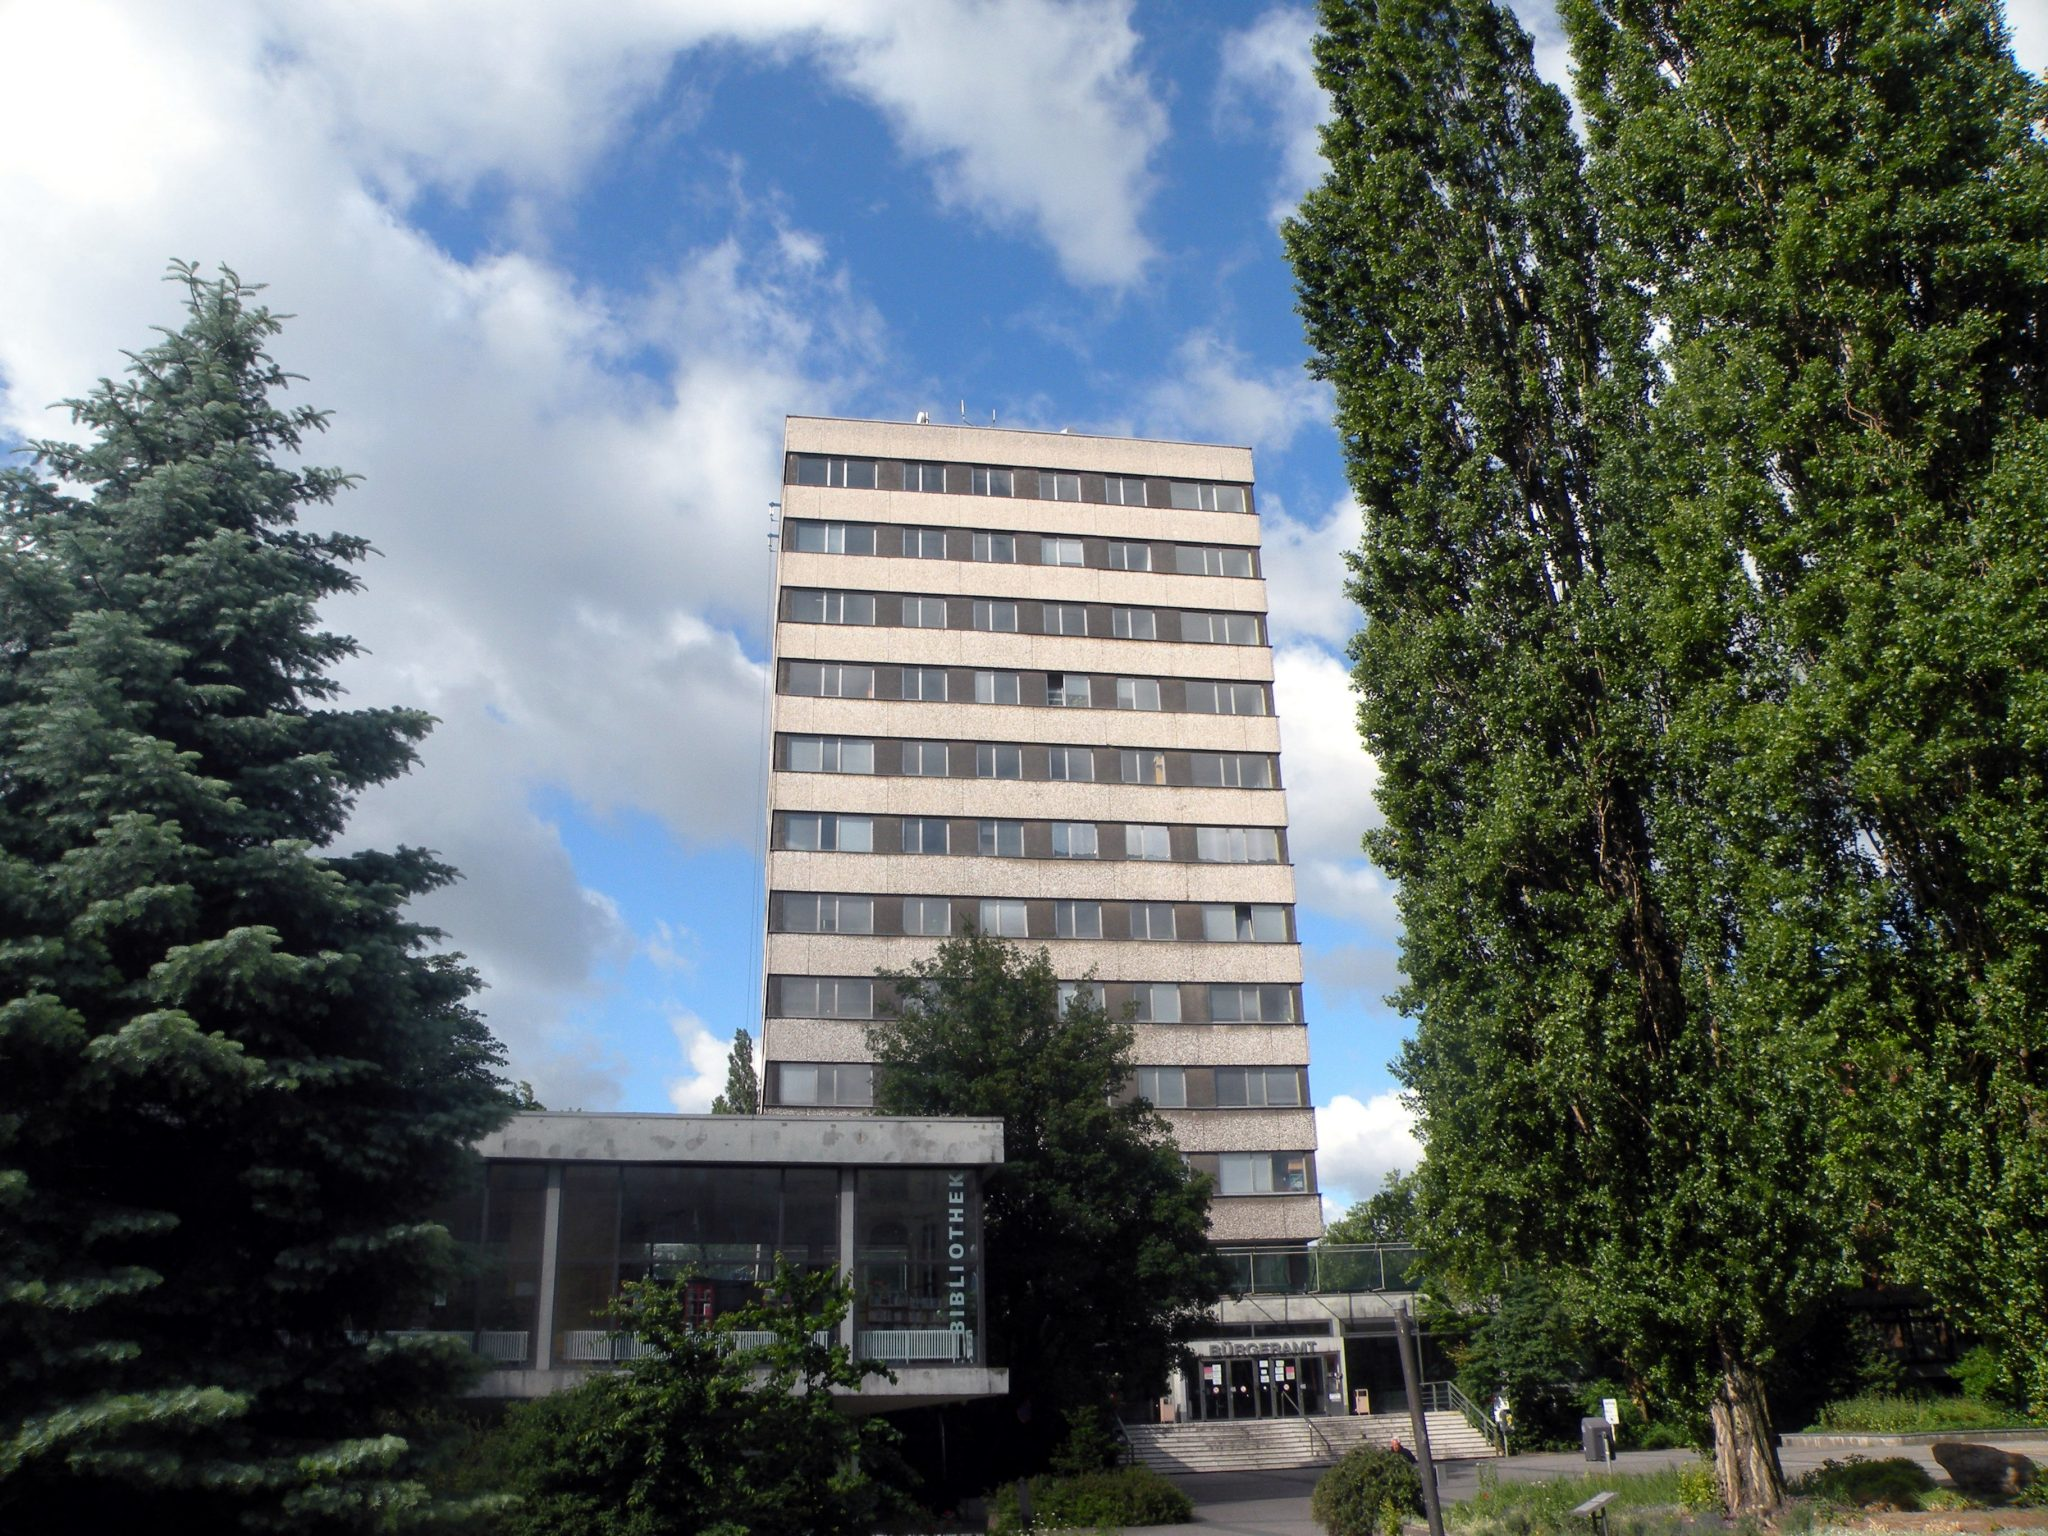 Ehem. BVV-Saal und Rathausturm